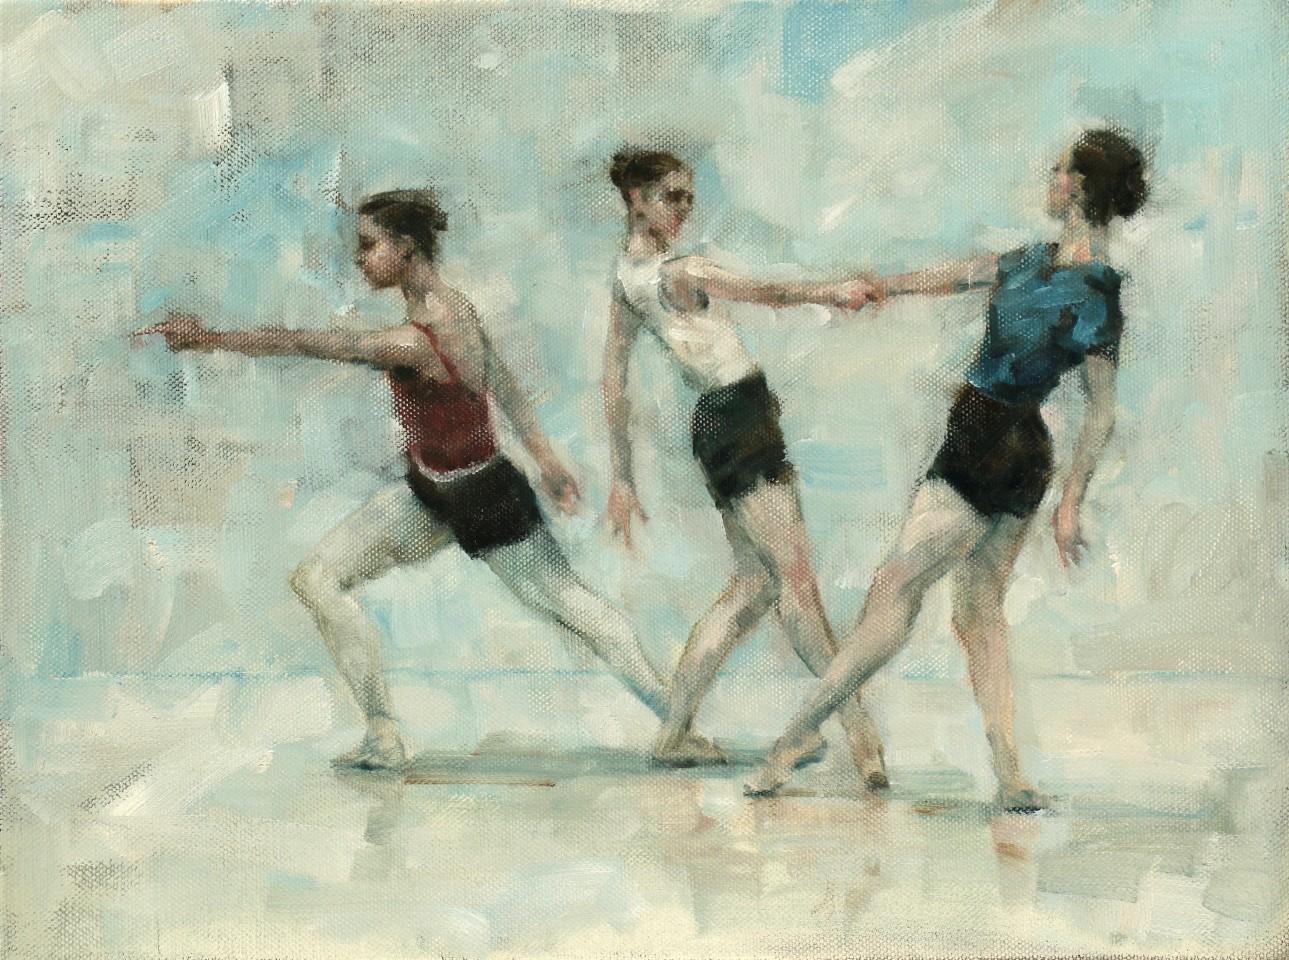 Carl Chapple, Ex Situ - Colleen Grace, Ann Louise Wall & Noami Stienstra (Ballet Cymru Rehearsal 171)